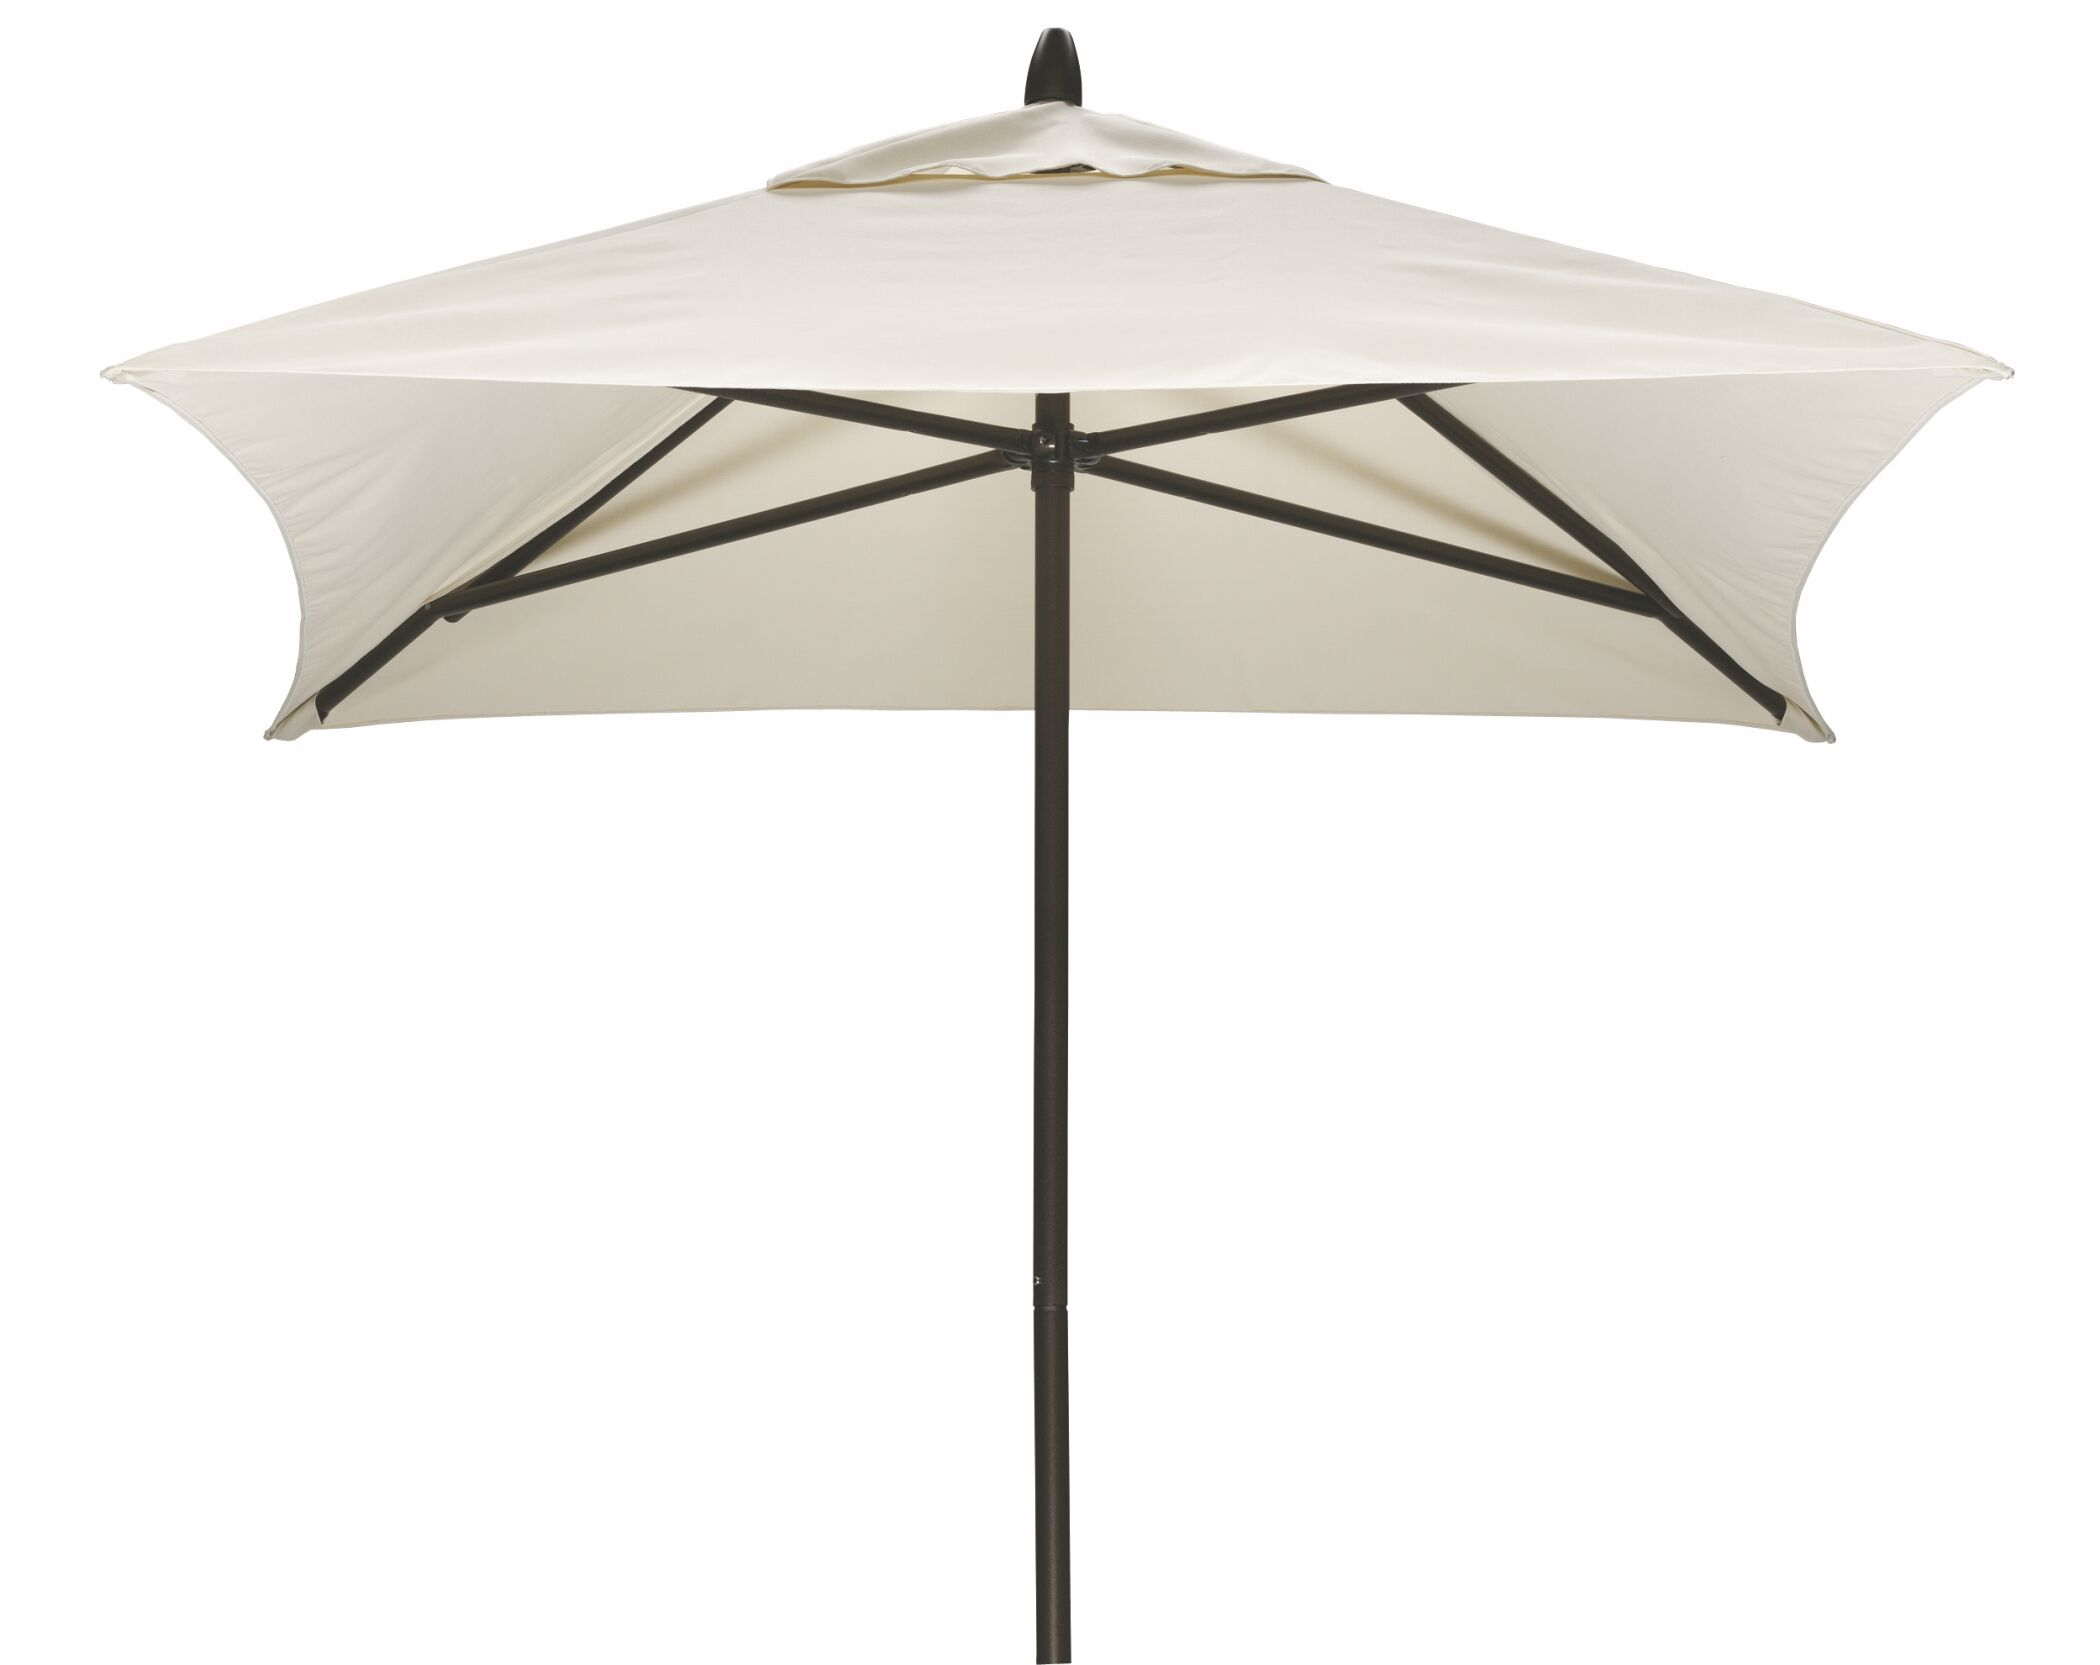 Commercial 6' Square Market Umbrella Frame Finish: Textured Beachwood, Fabric: Harvest